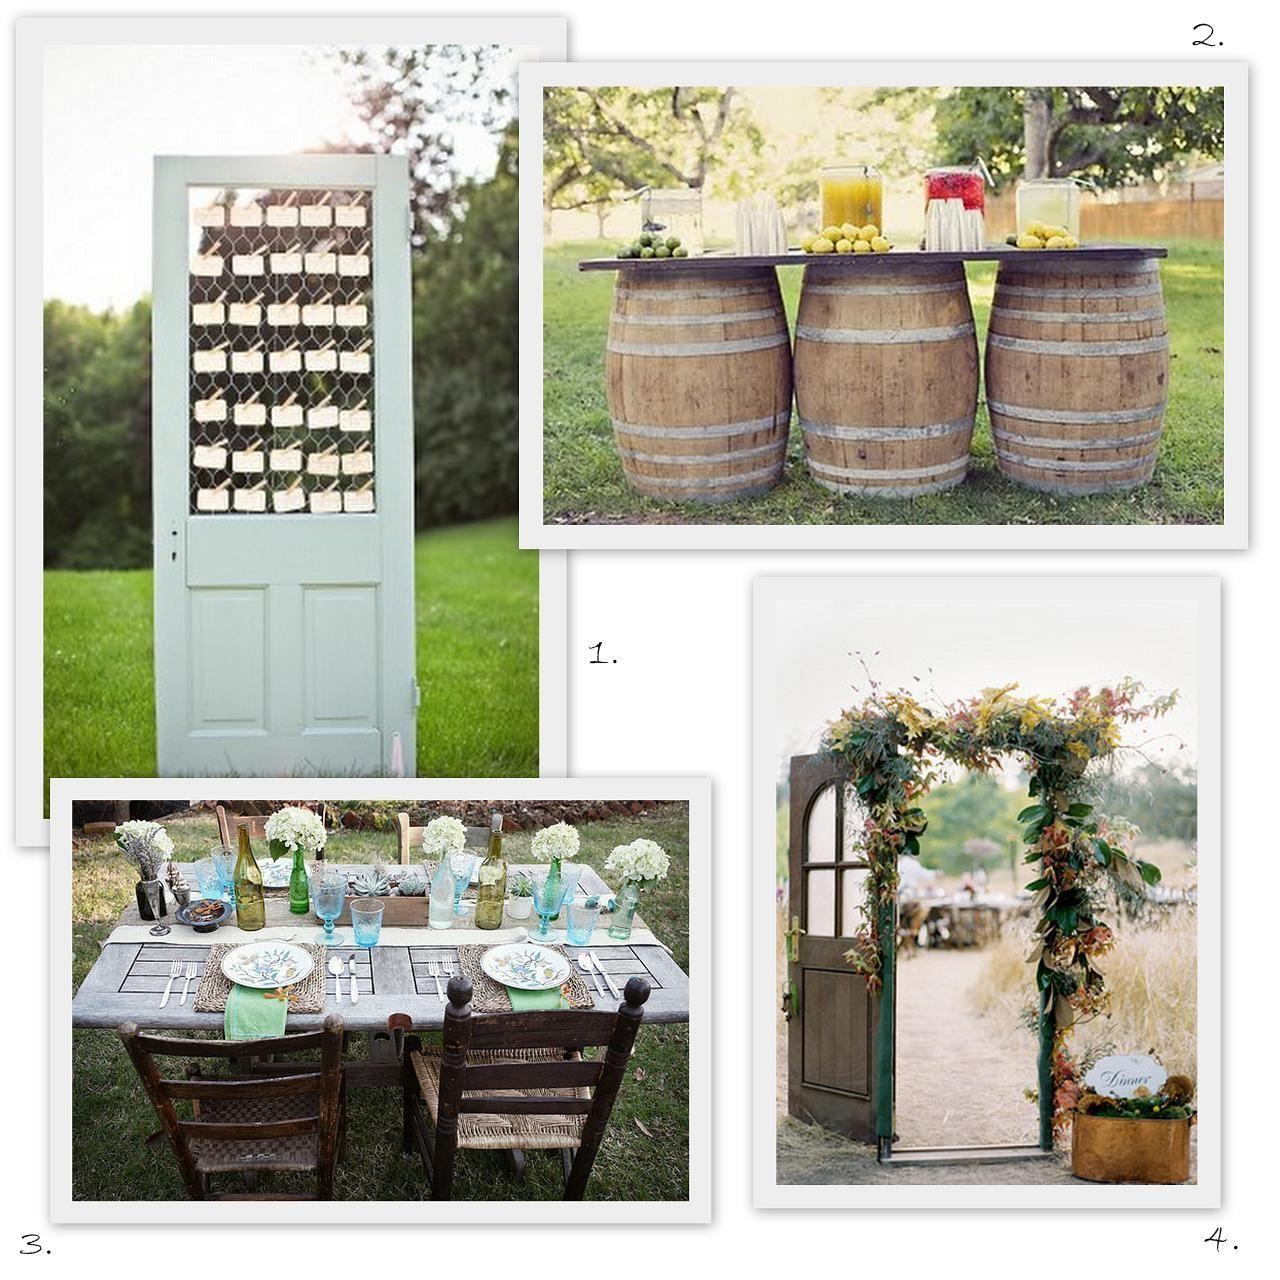 Vintage Barn Wedding Ideas: I Do, I Do, Love You!